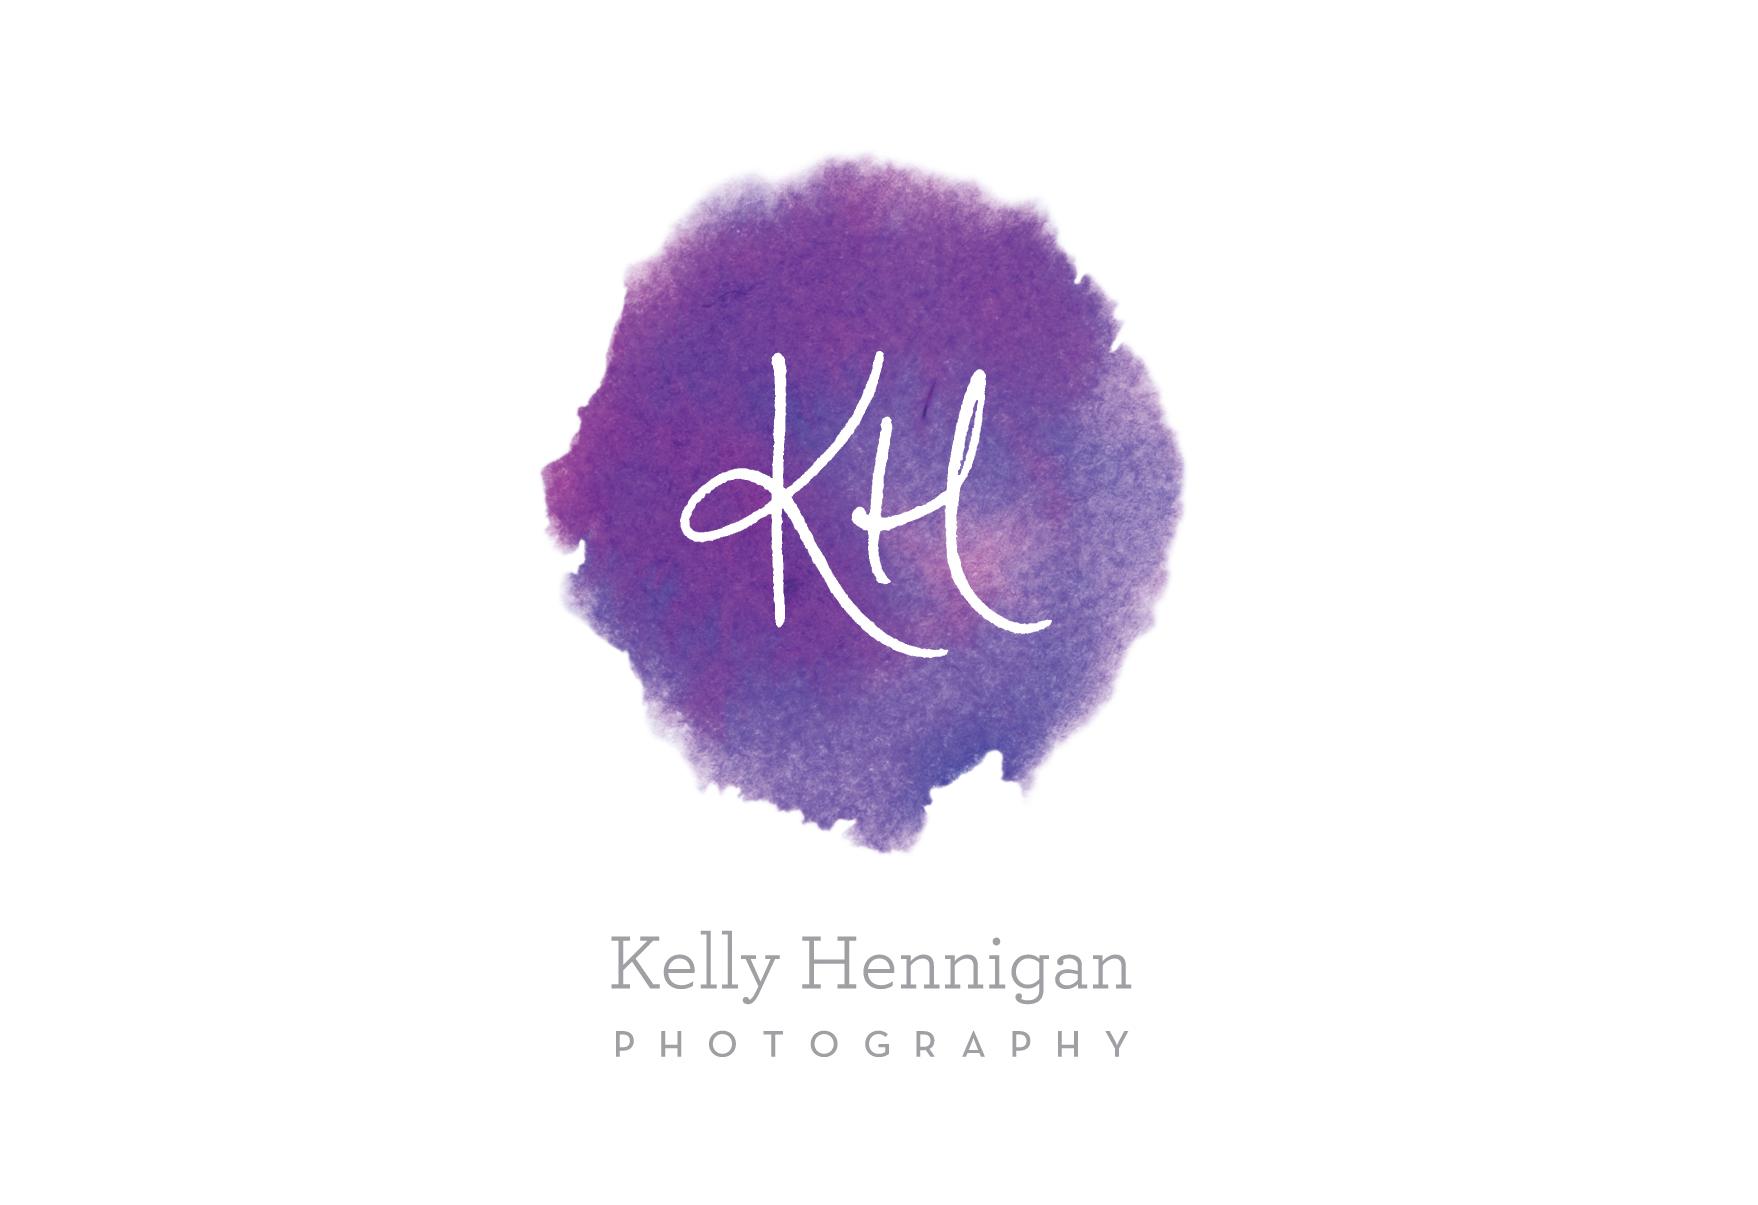 julierado-kelly-hennigan-photography-logo.JPG